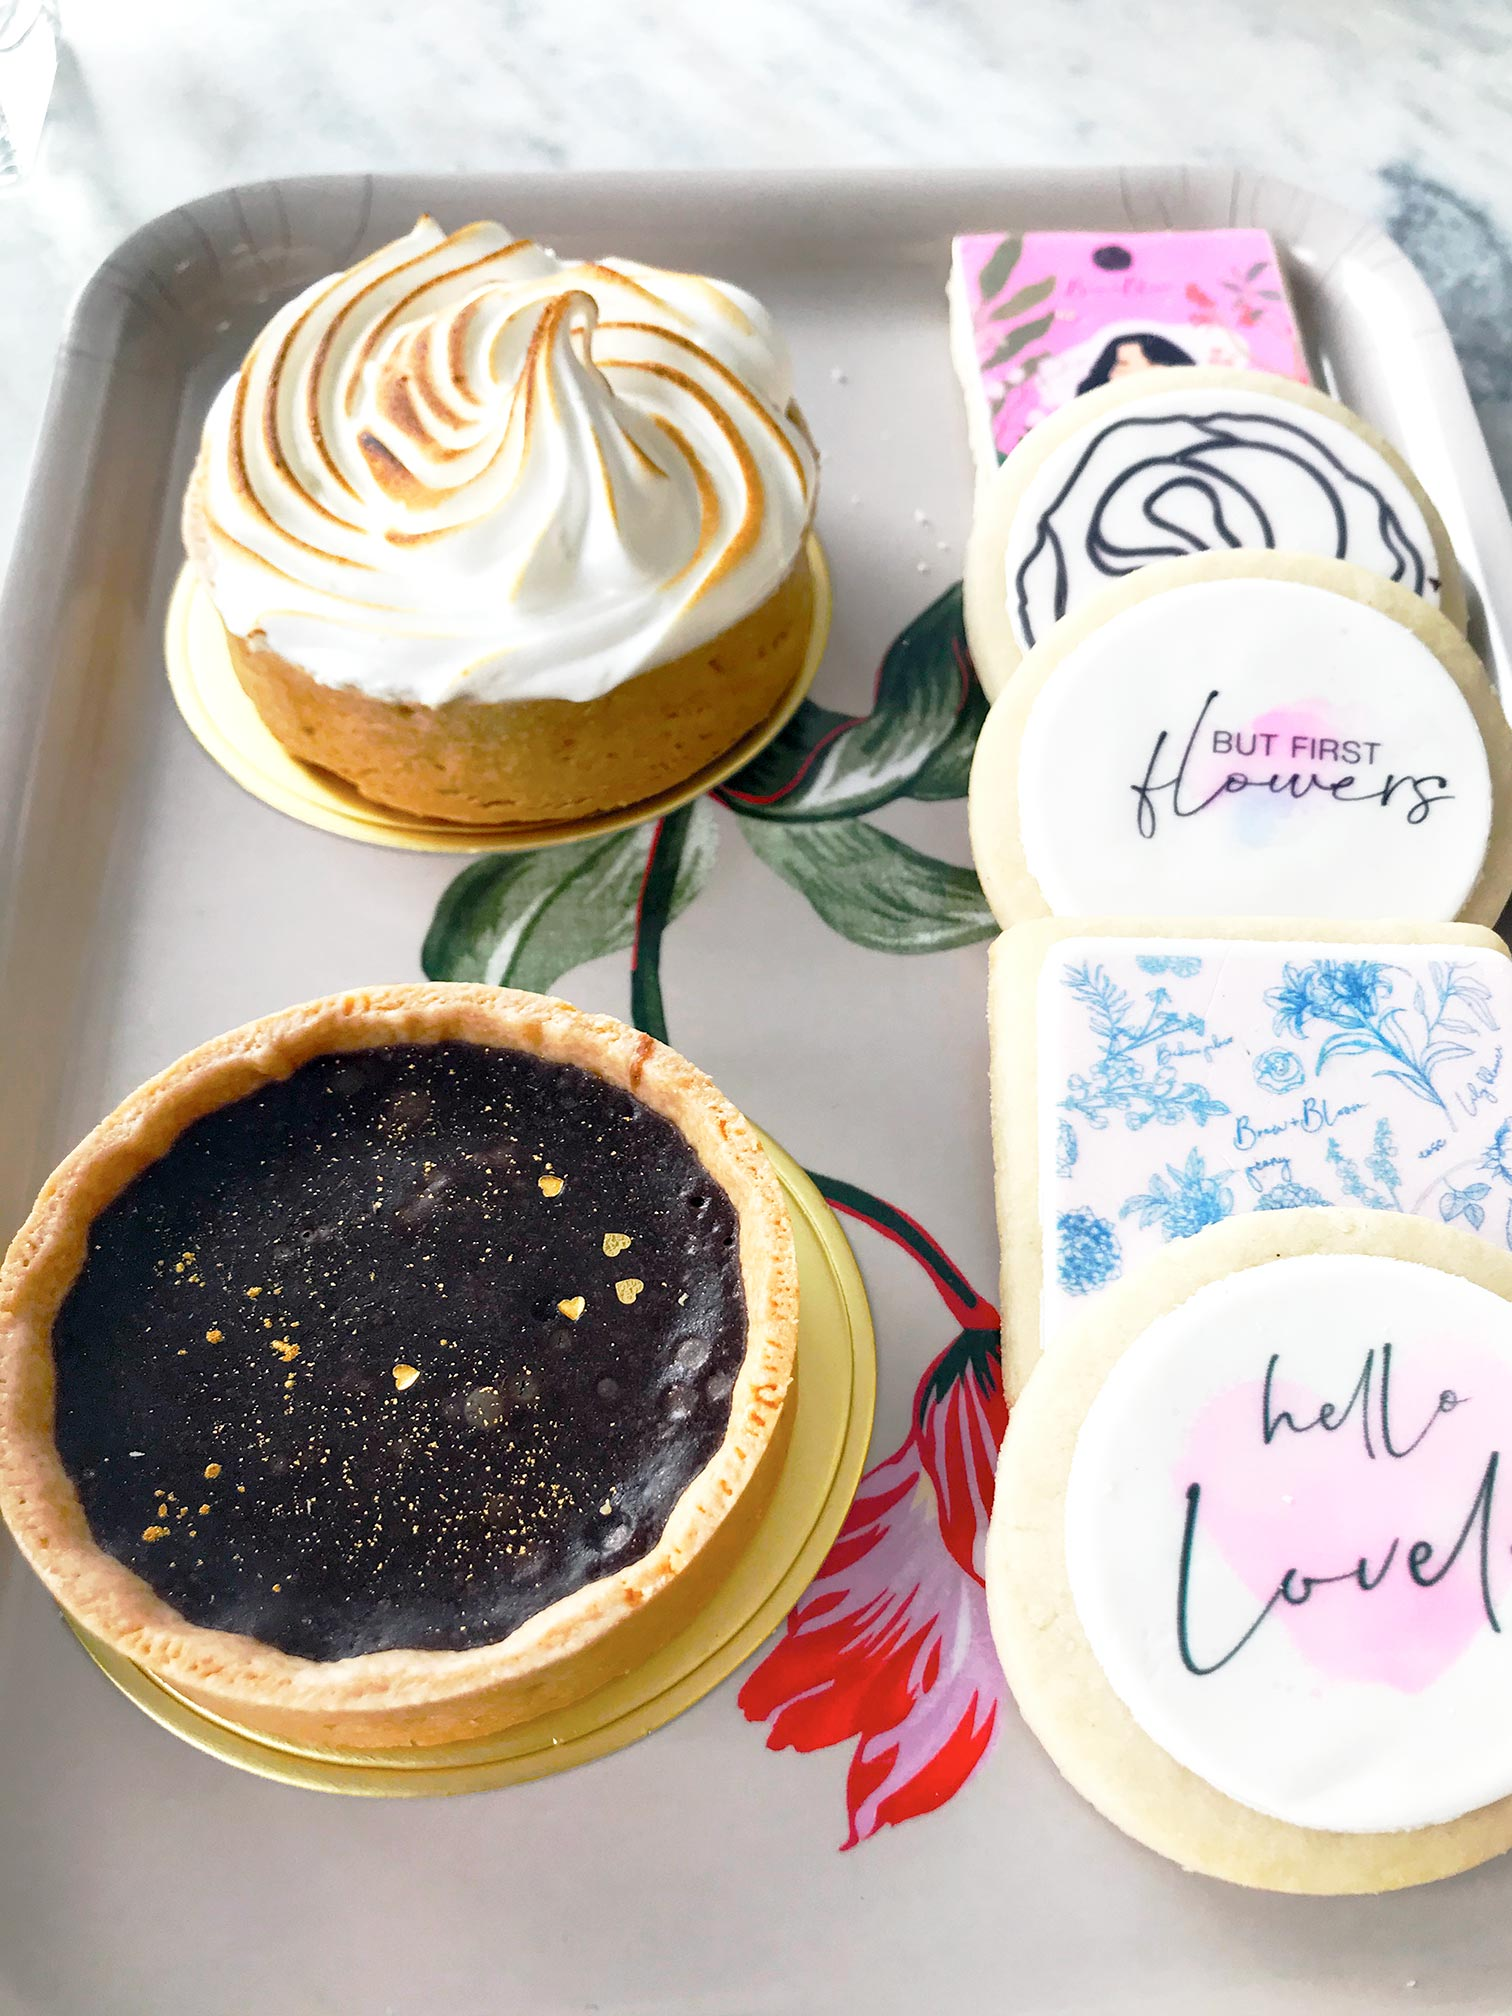 Cupcake and tart desserts